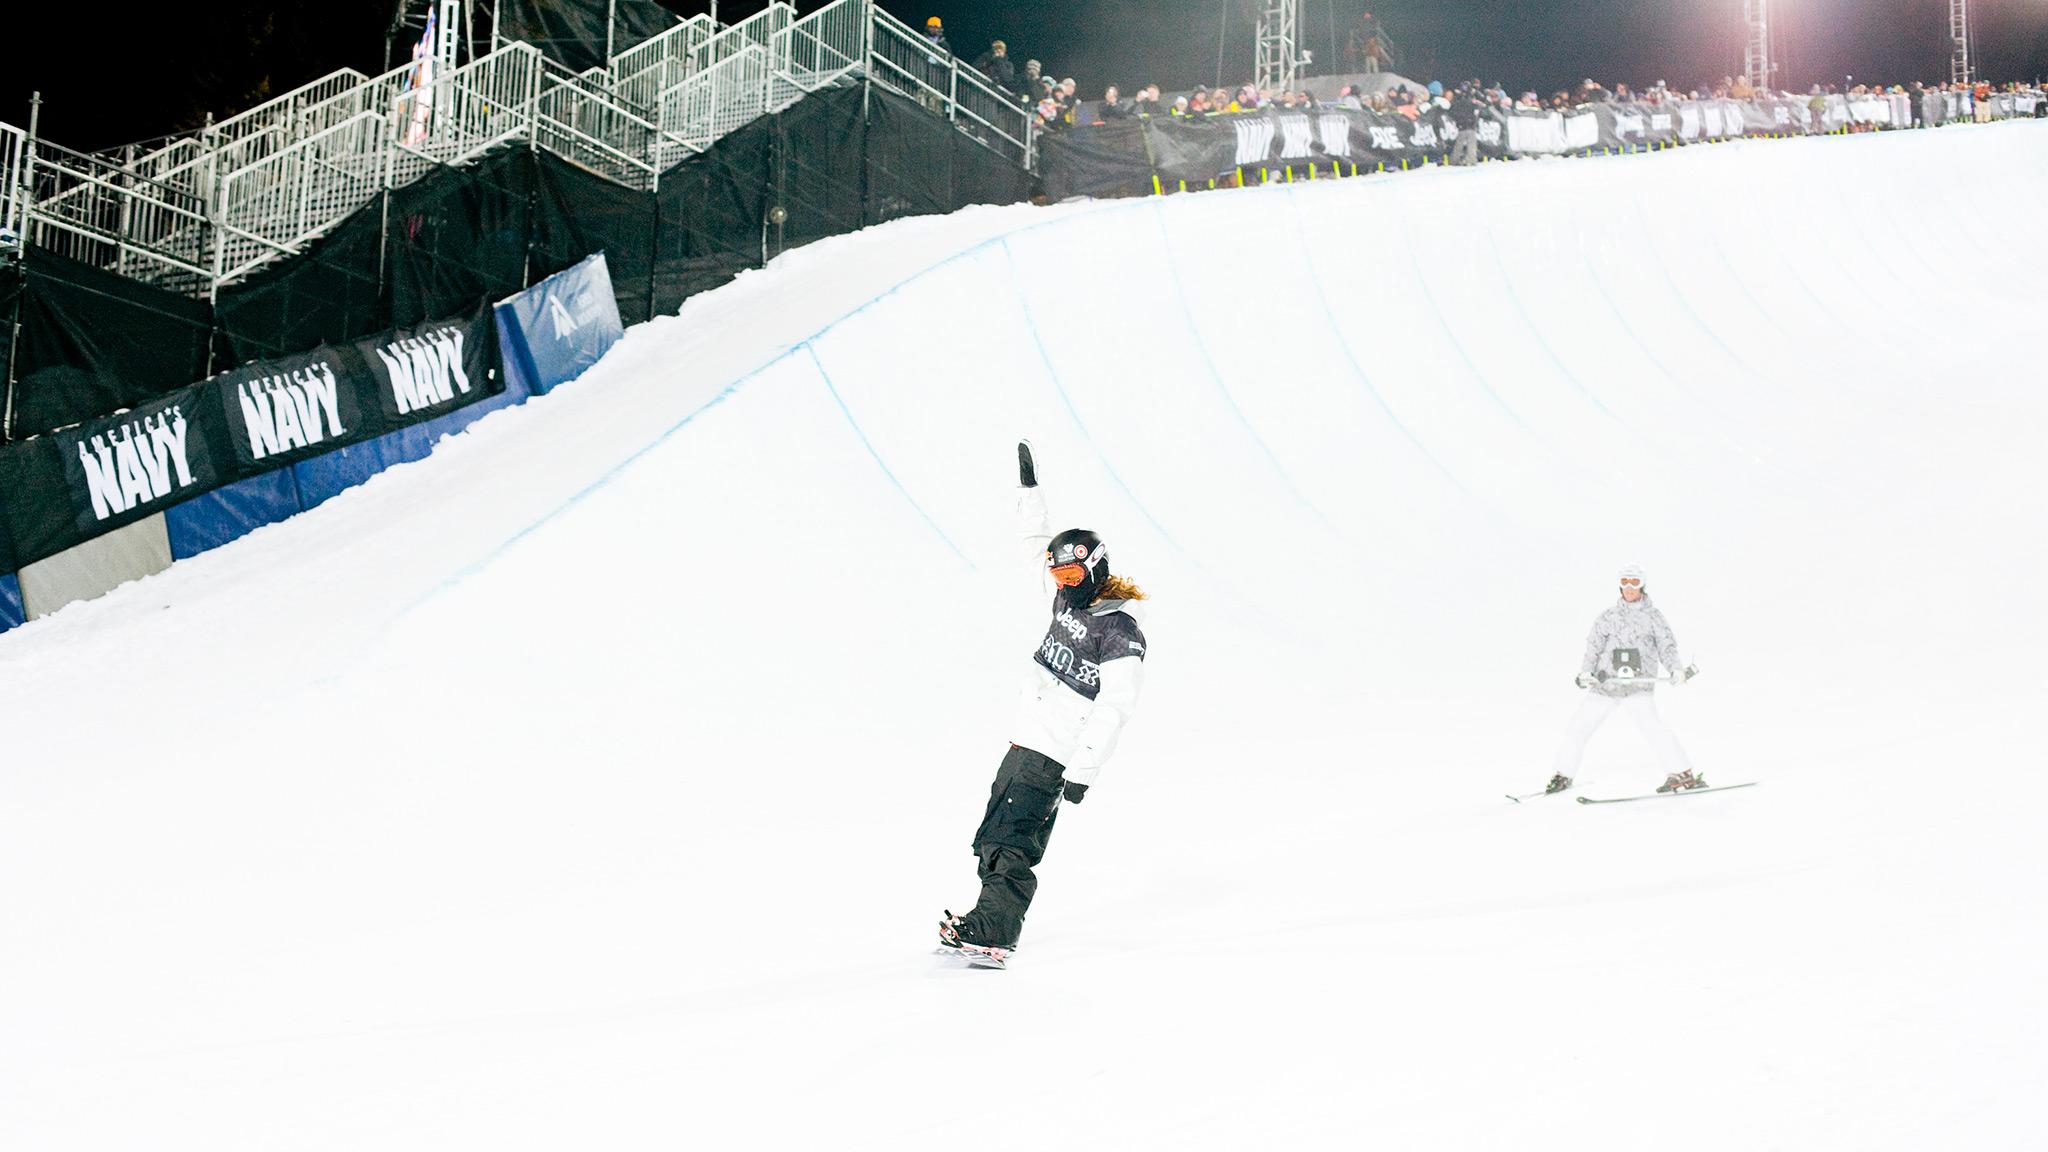 Aspen, 2010